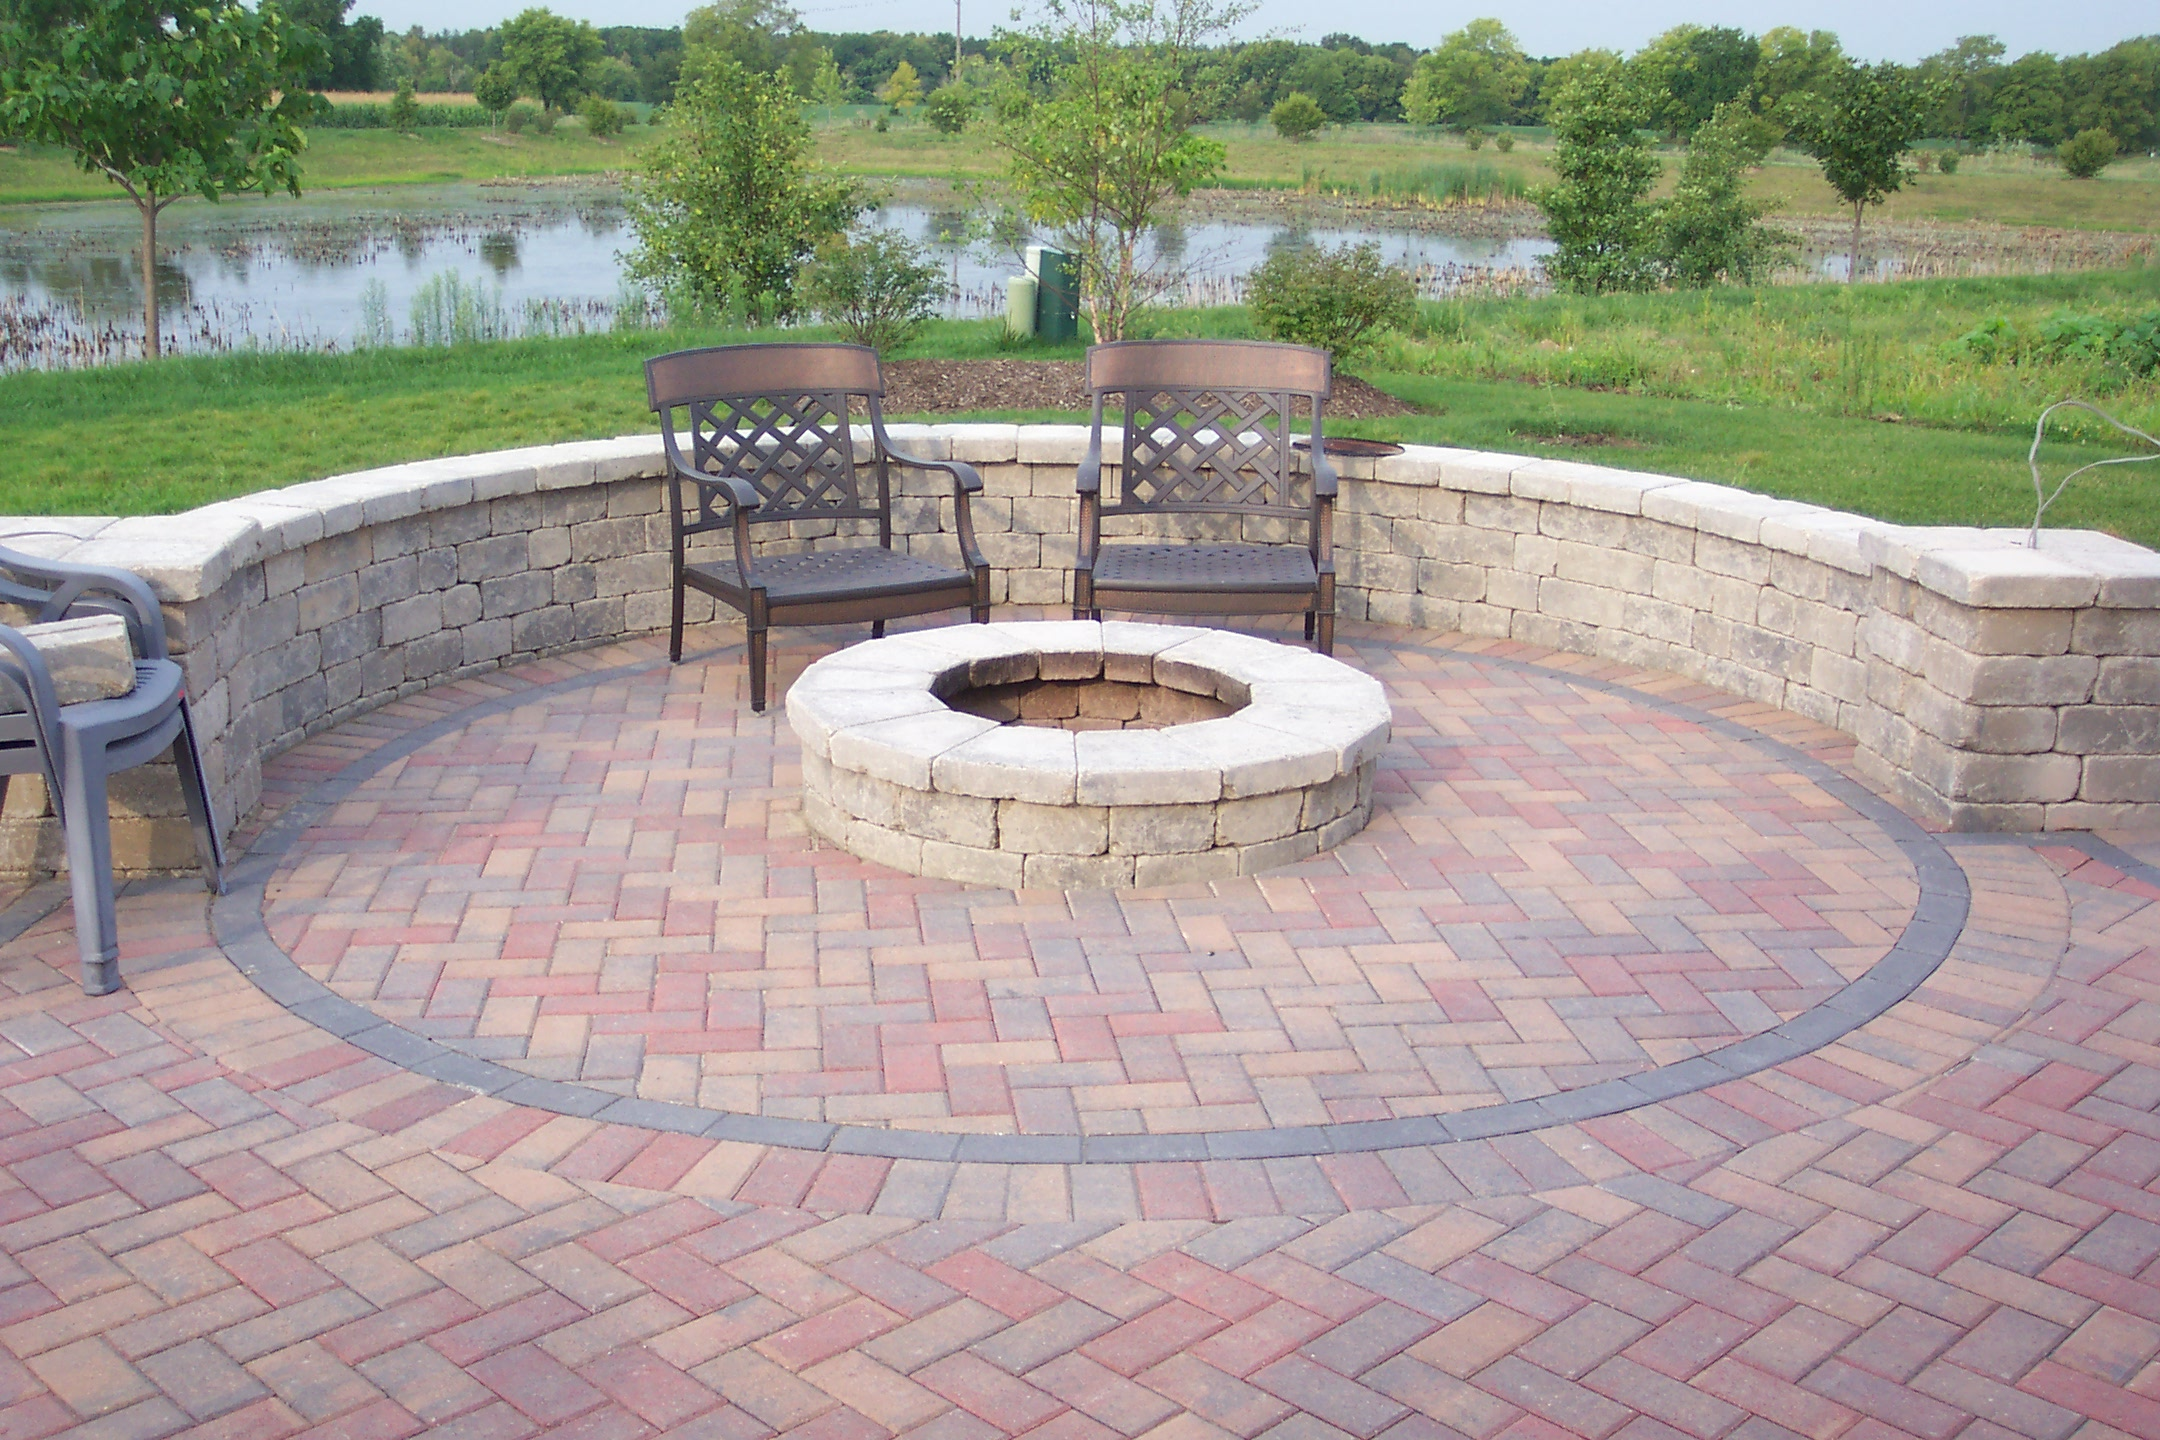 Brick Backyard Fire Pit Designs Design and Ideas